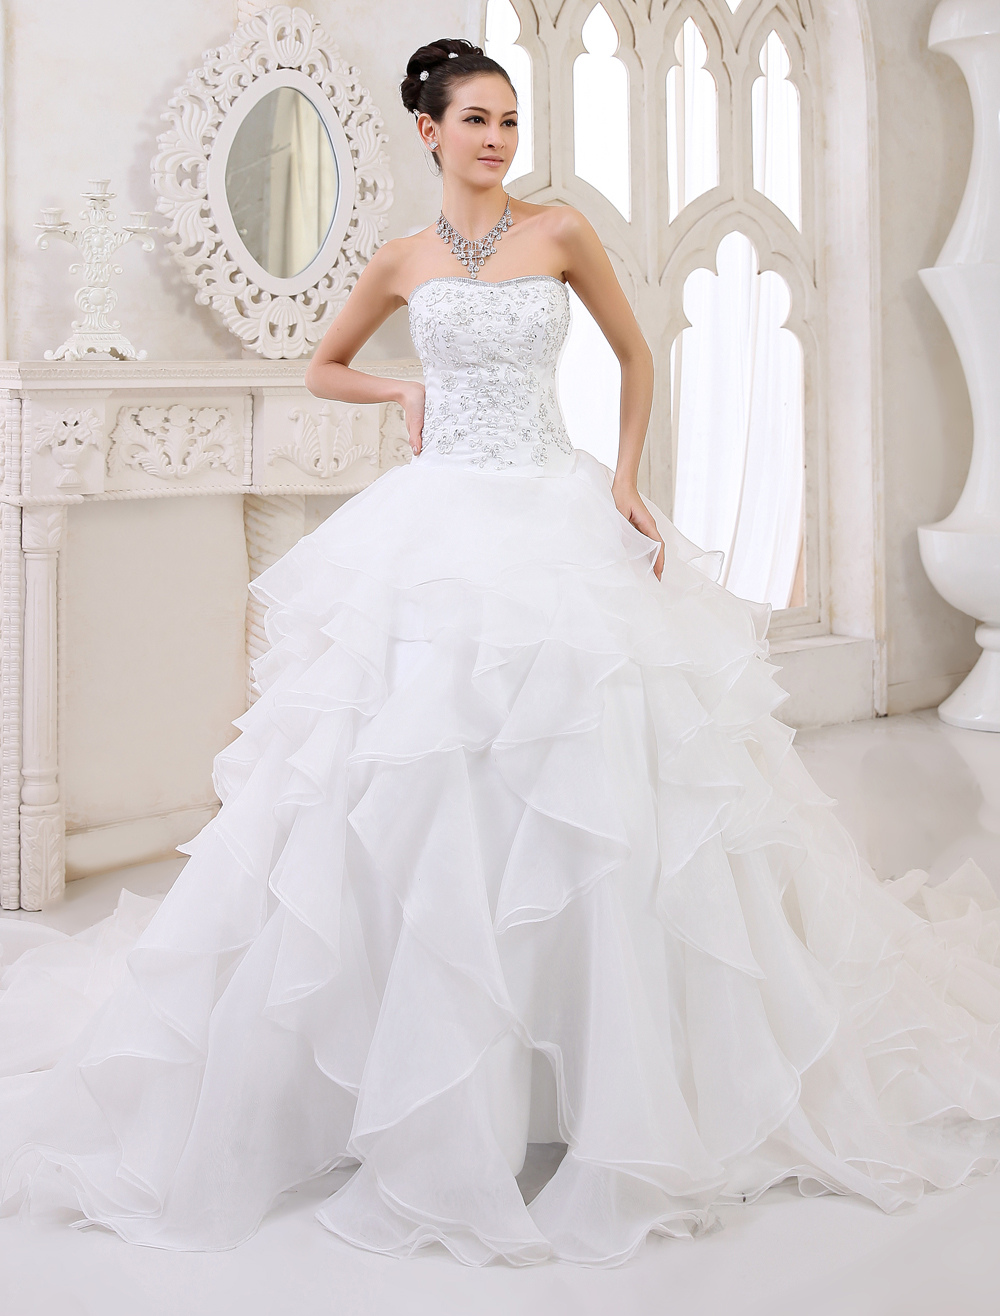 Ivory Wedding Dress Tiered Strapless Lace Up Rhinestone Wedding